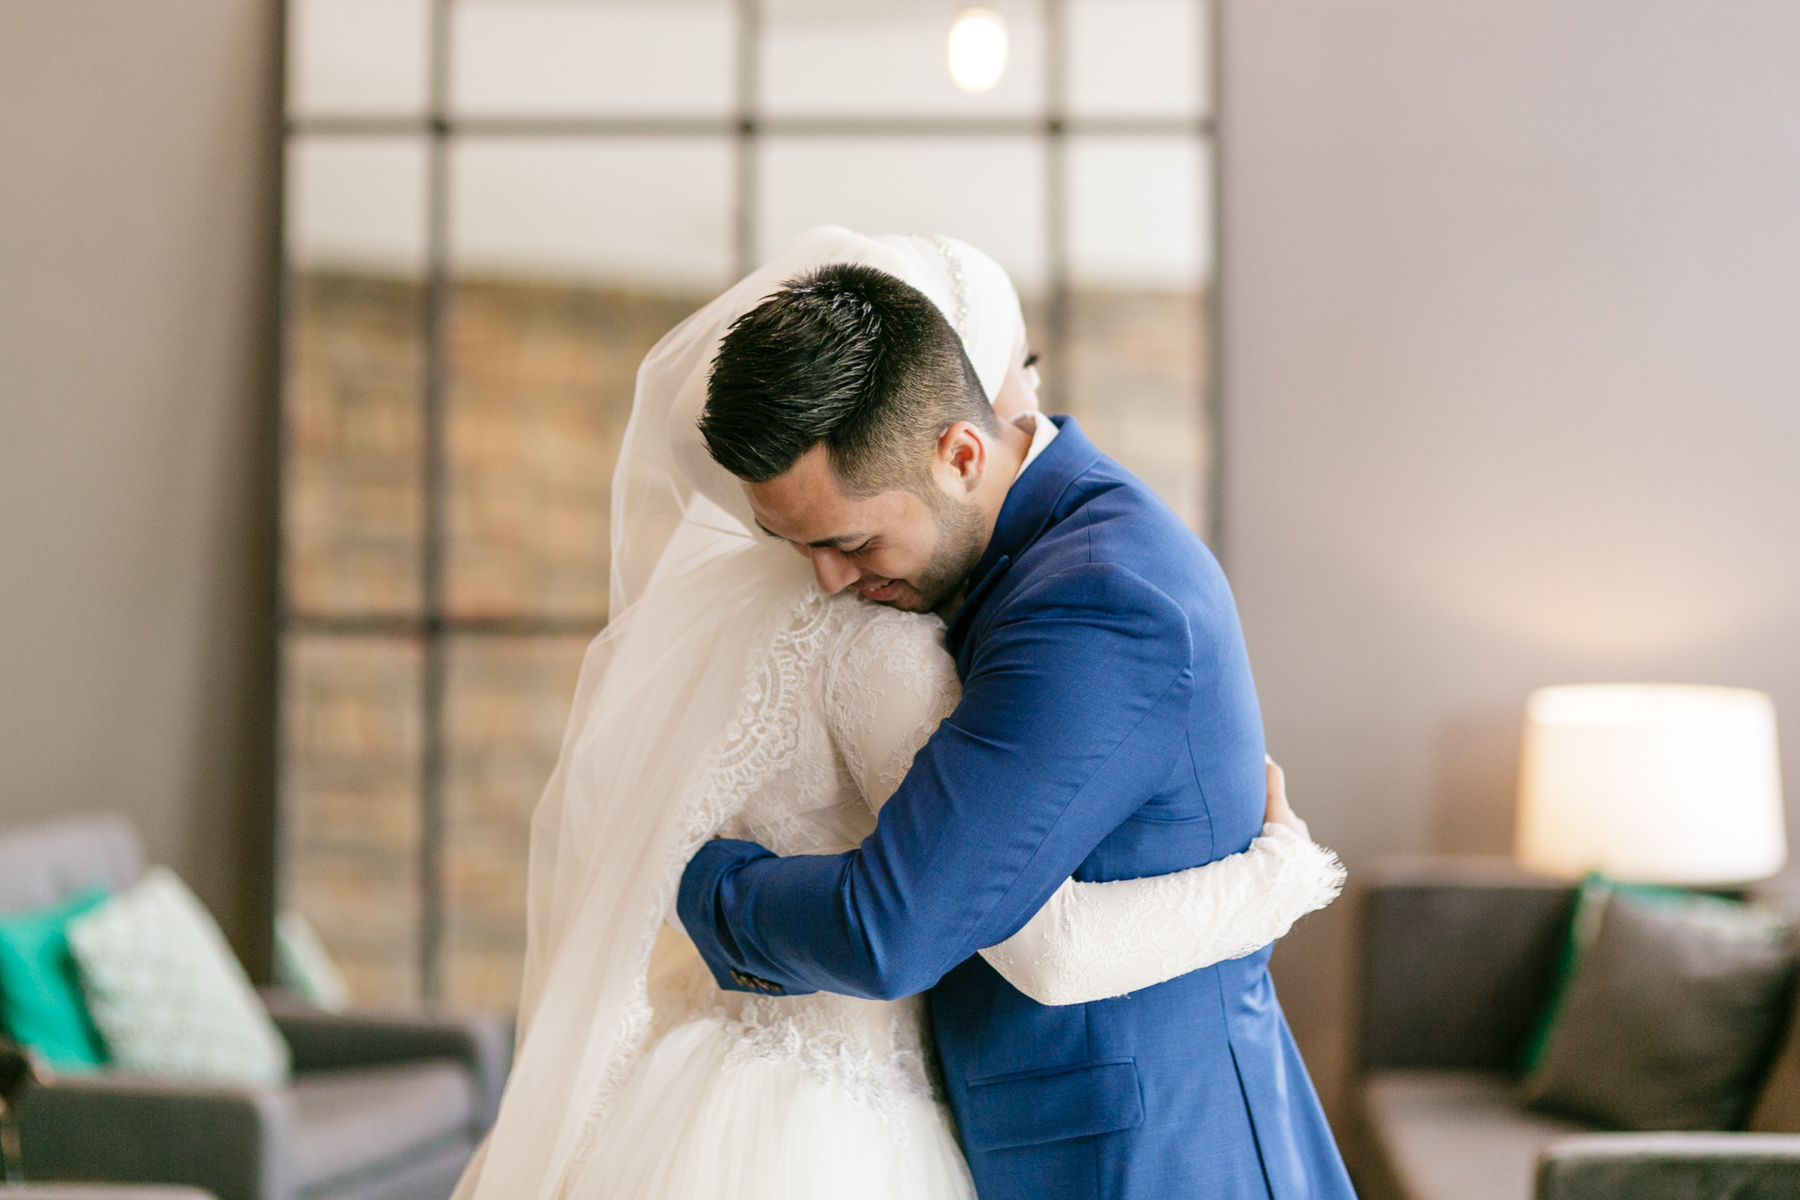 joeewong-ayad-liberty-grand-toronto-wedding-210